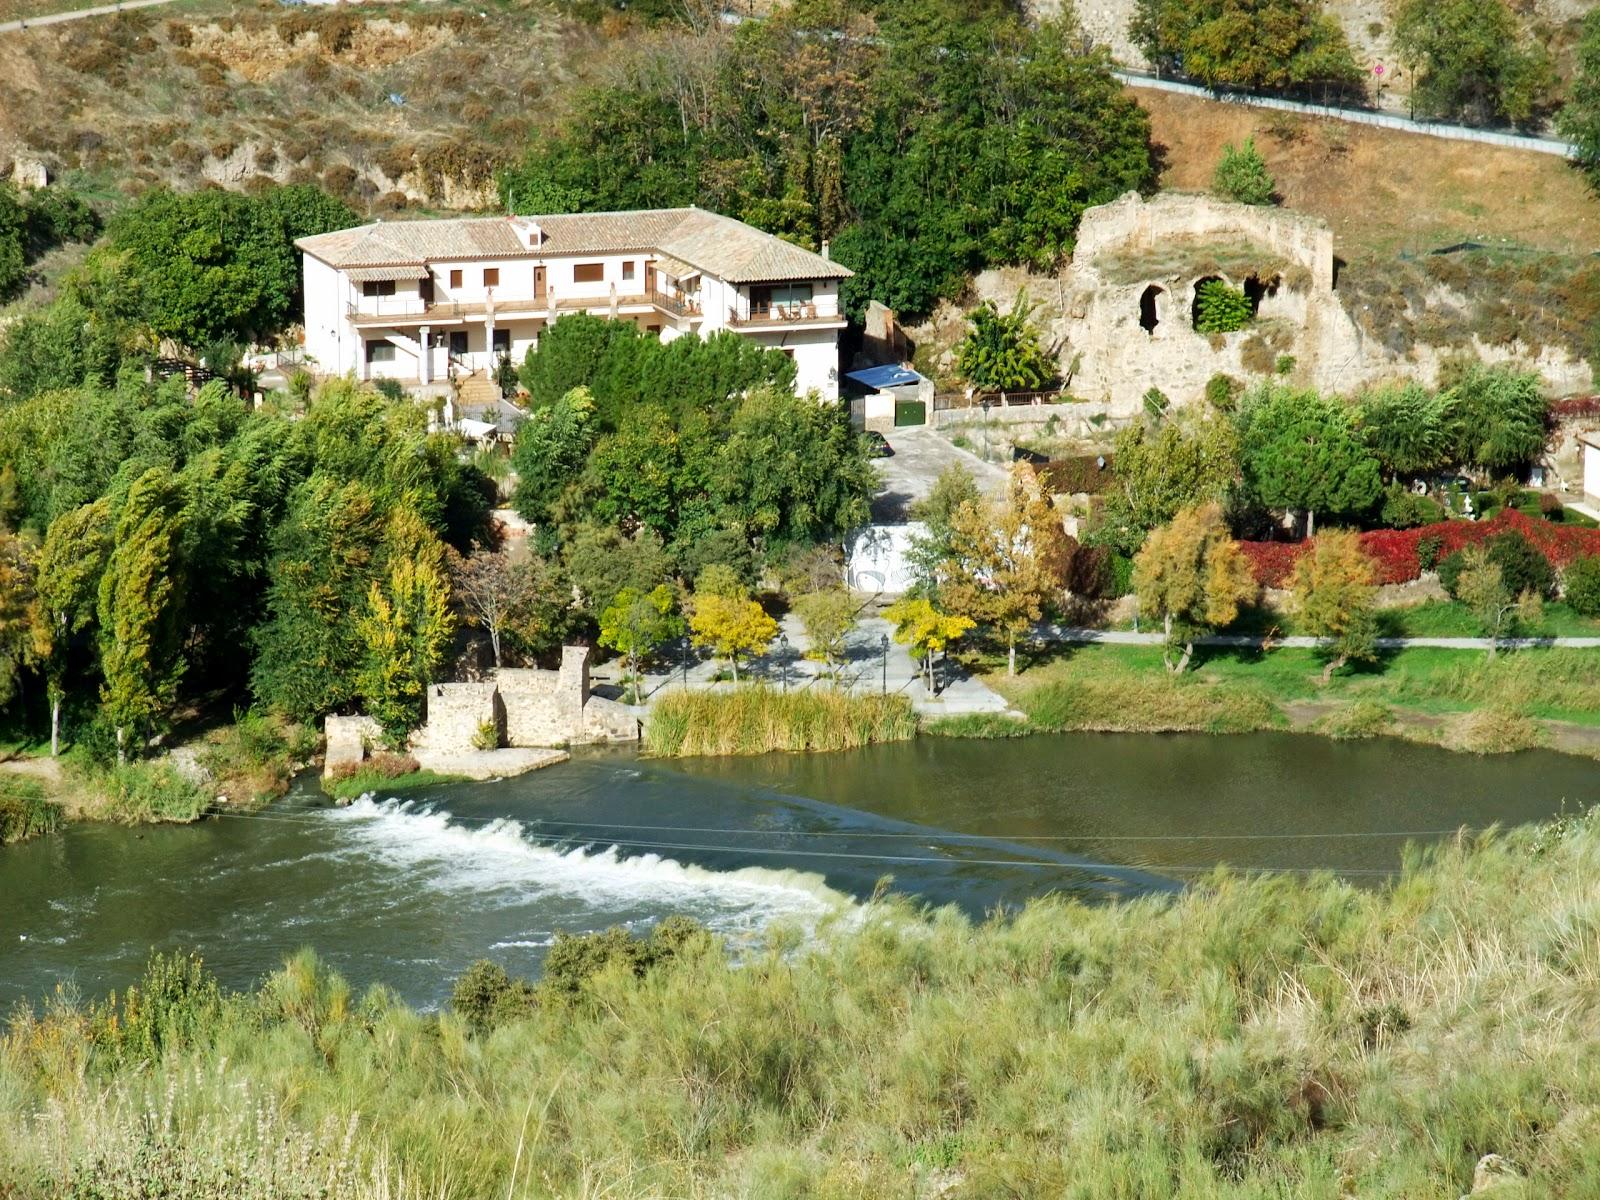 Baño Arabe En Toledo:Buscando Montsalvatge: TOLEDO Baños de Yuso o de San Sebastián